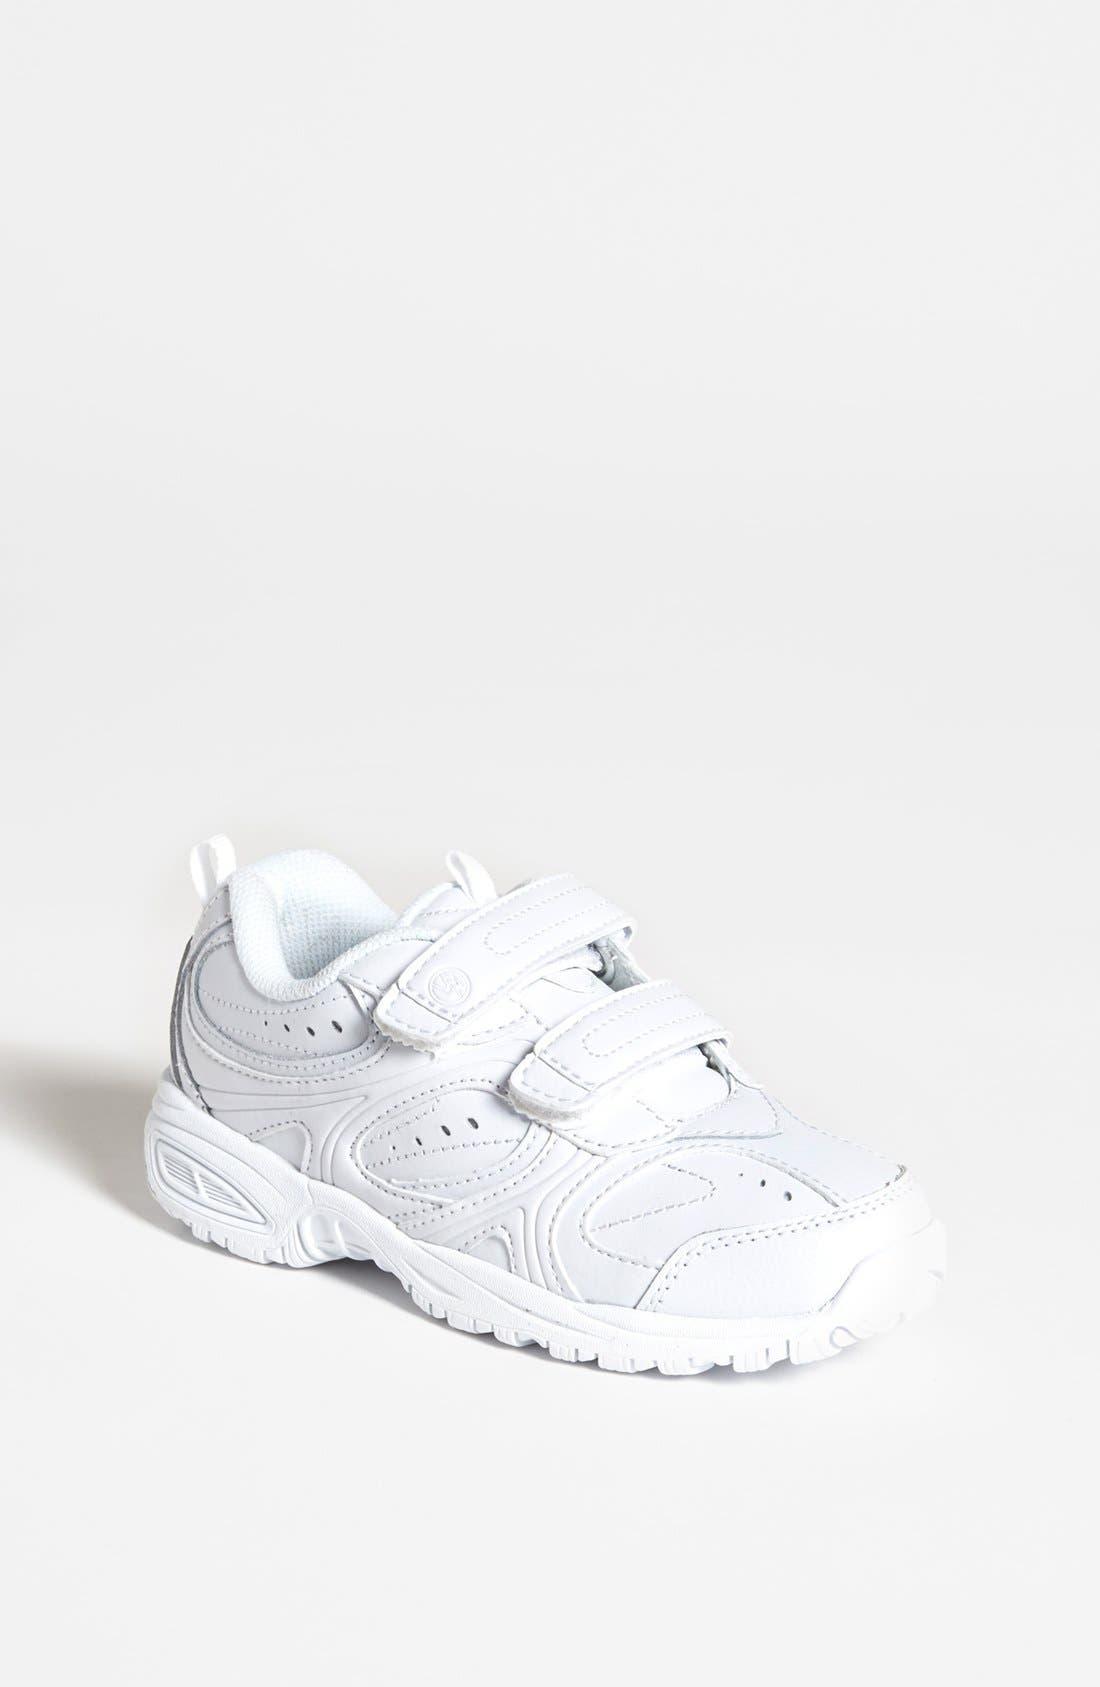 Alternate Image 1 Selected - Stride Rite 'Cooper' Sneaker (Toddler, Little Kid & Big Kid)